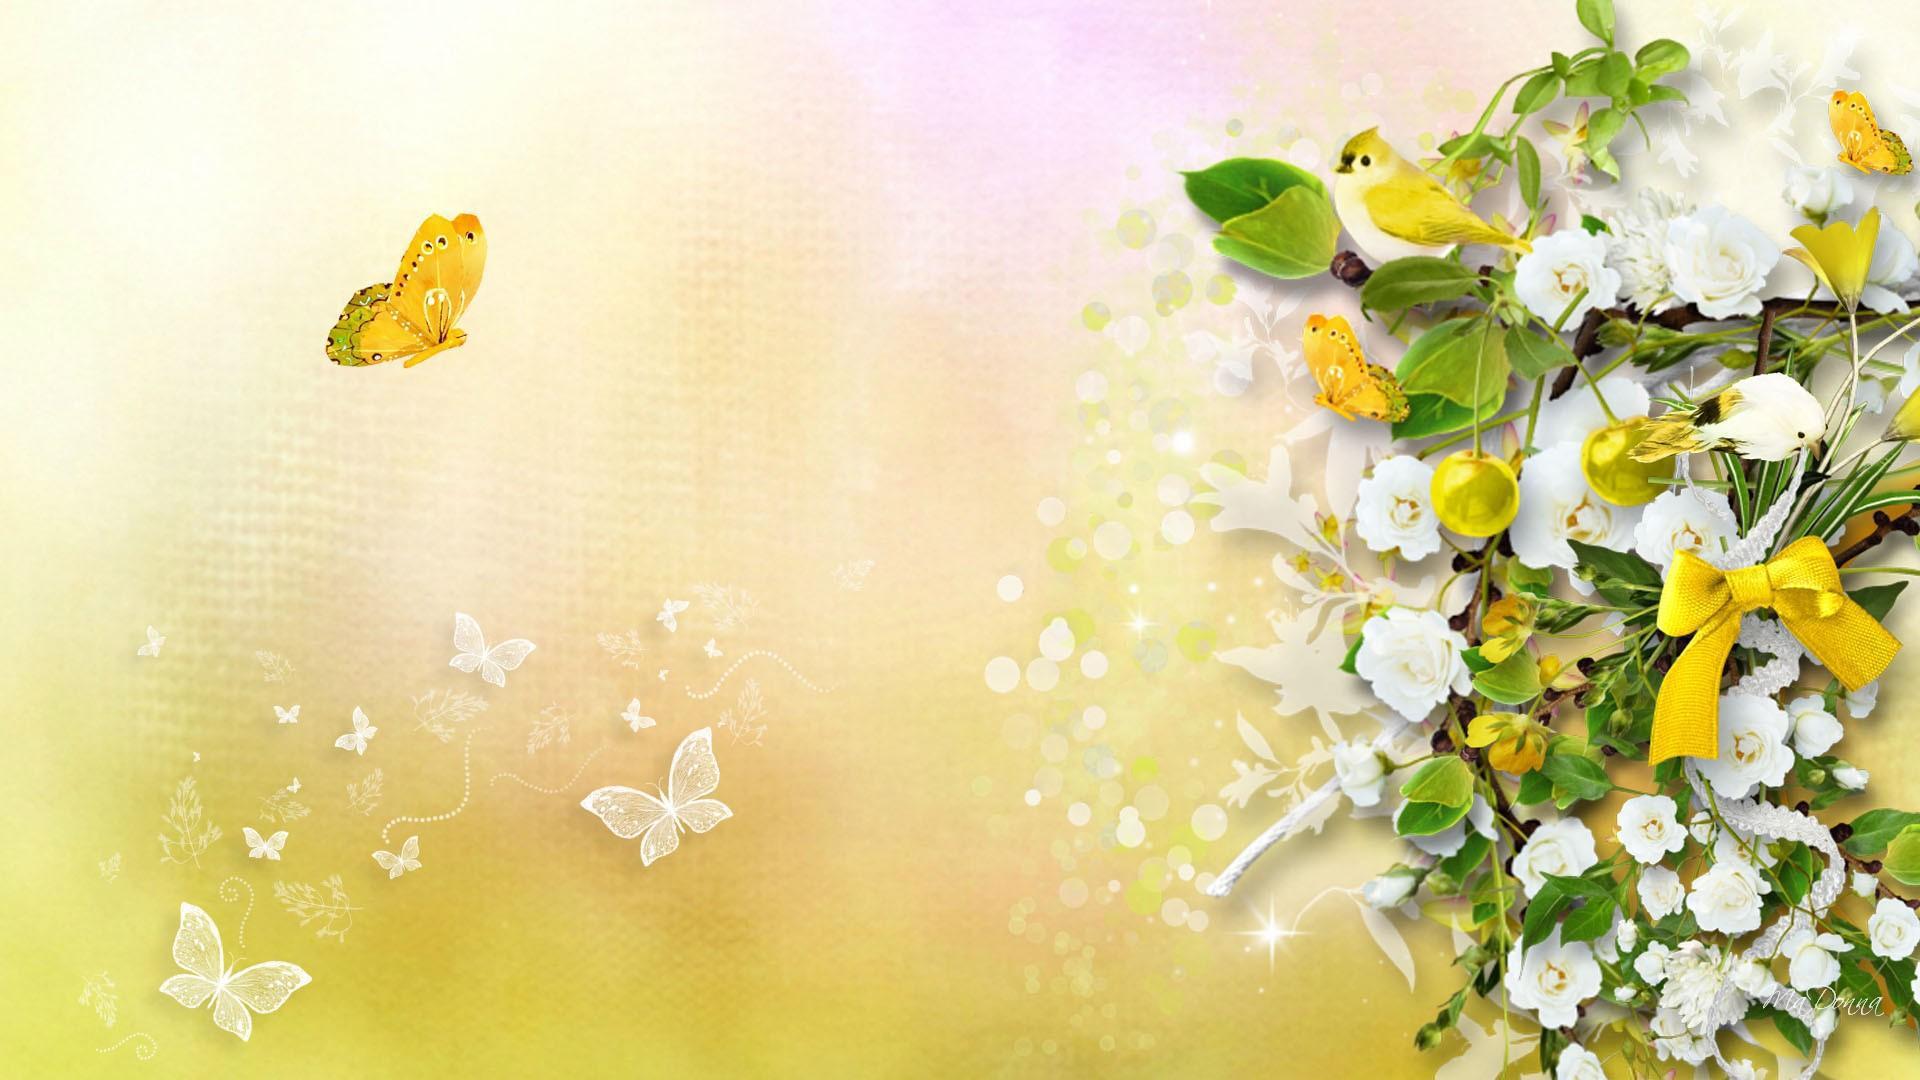 Desktop Wallpaper Hd 3d Full Screen Baby Yellow Sunshine Hd Desktop Wallpaper Widescreen High